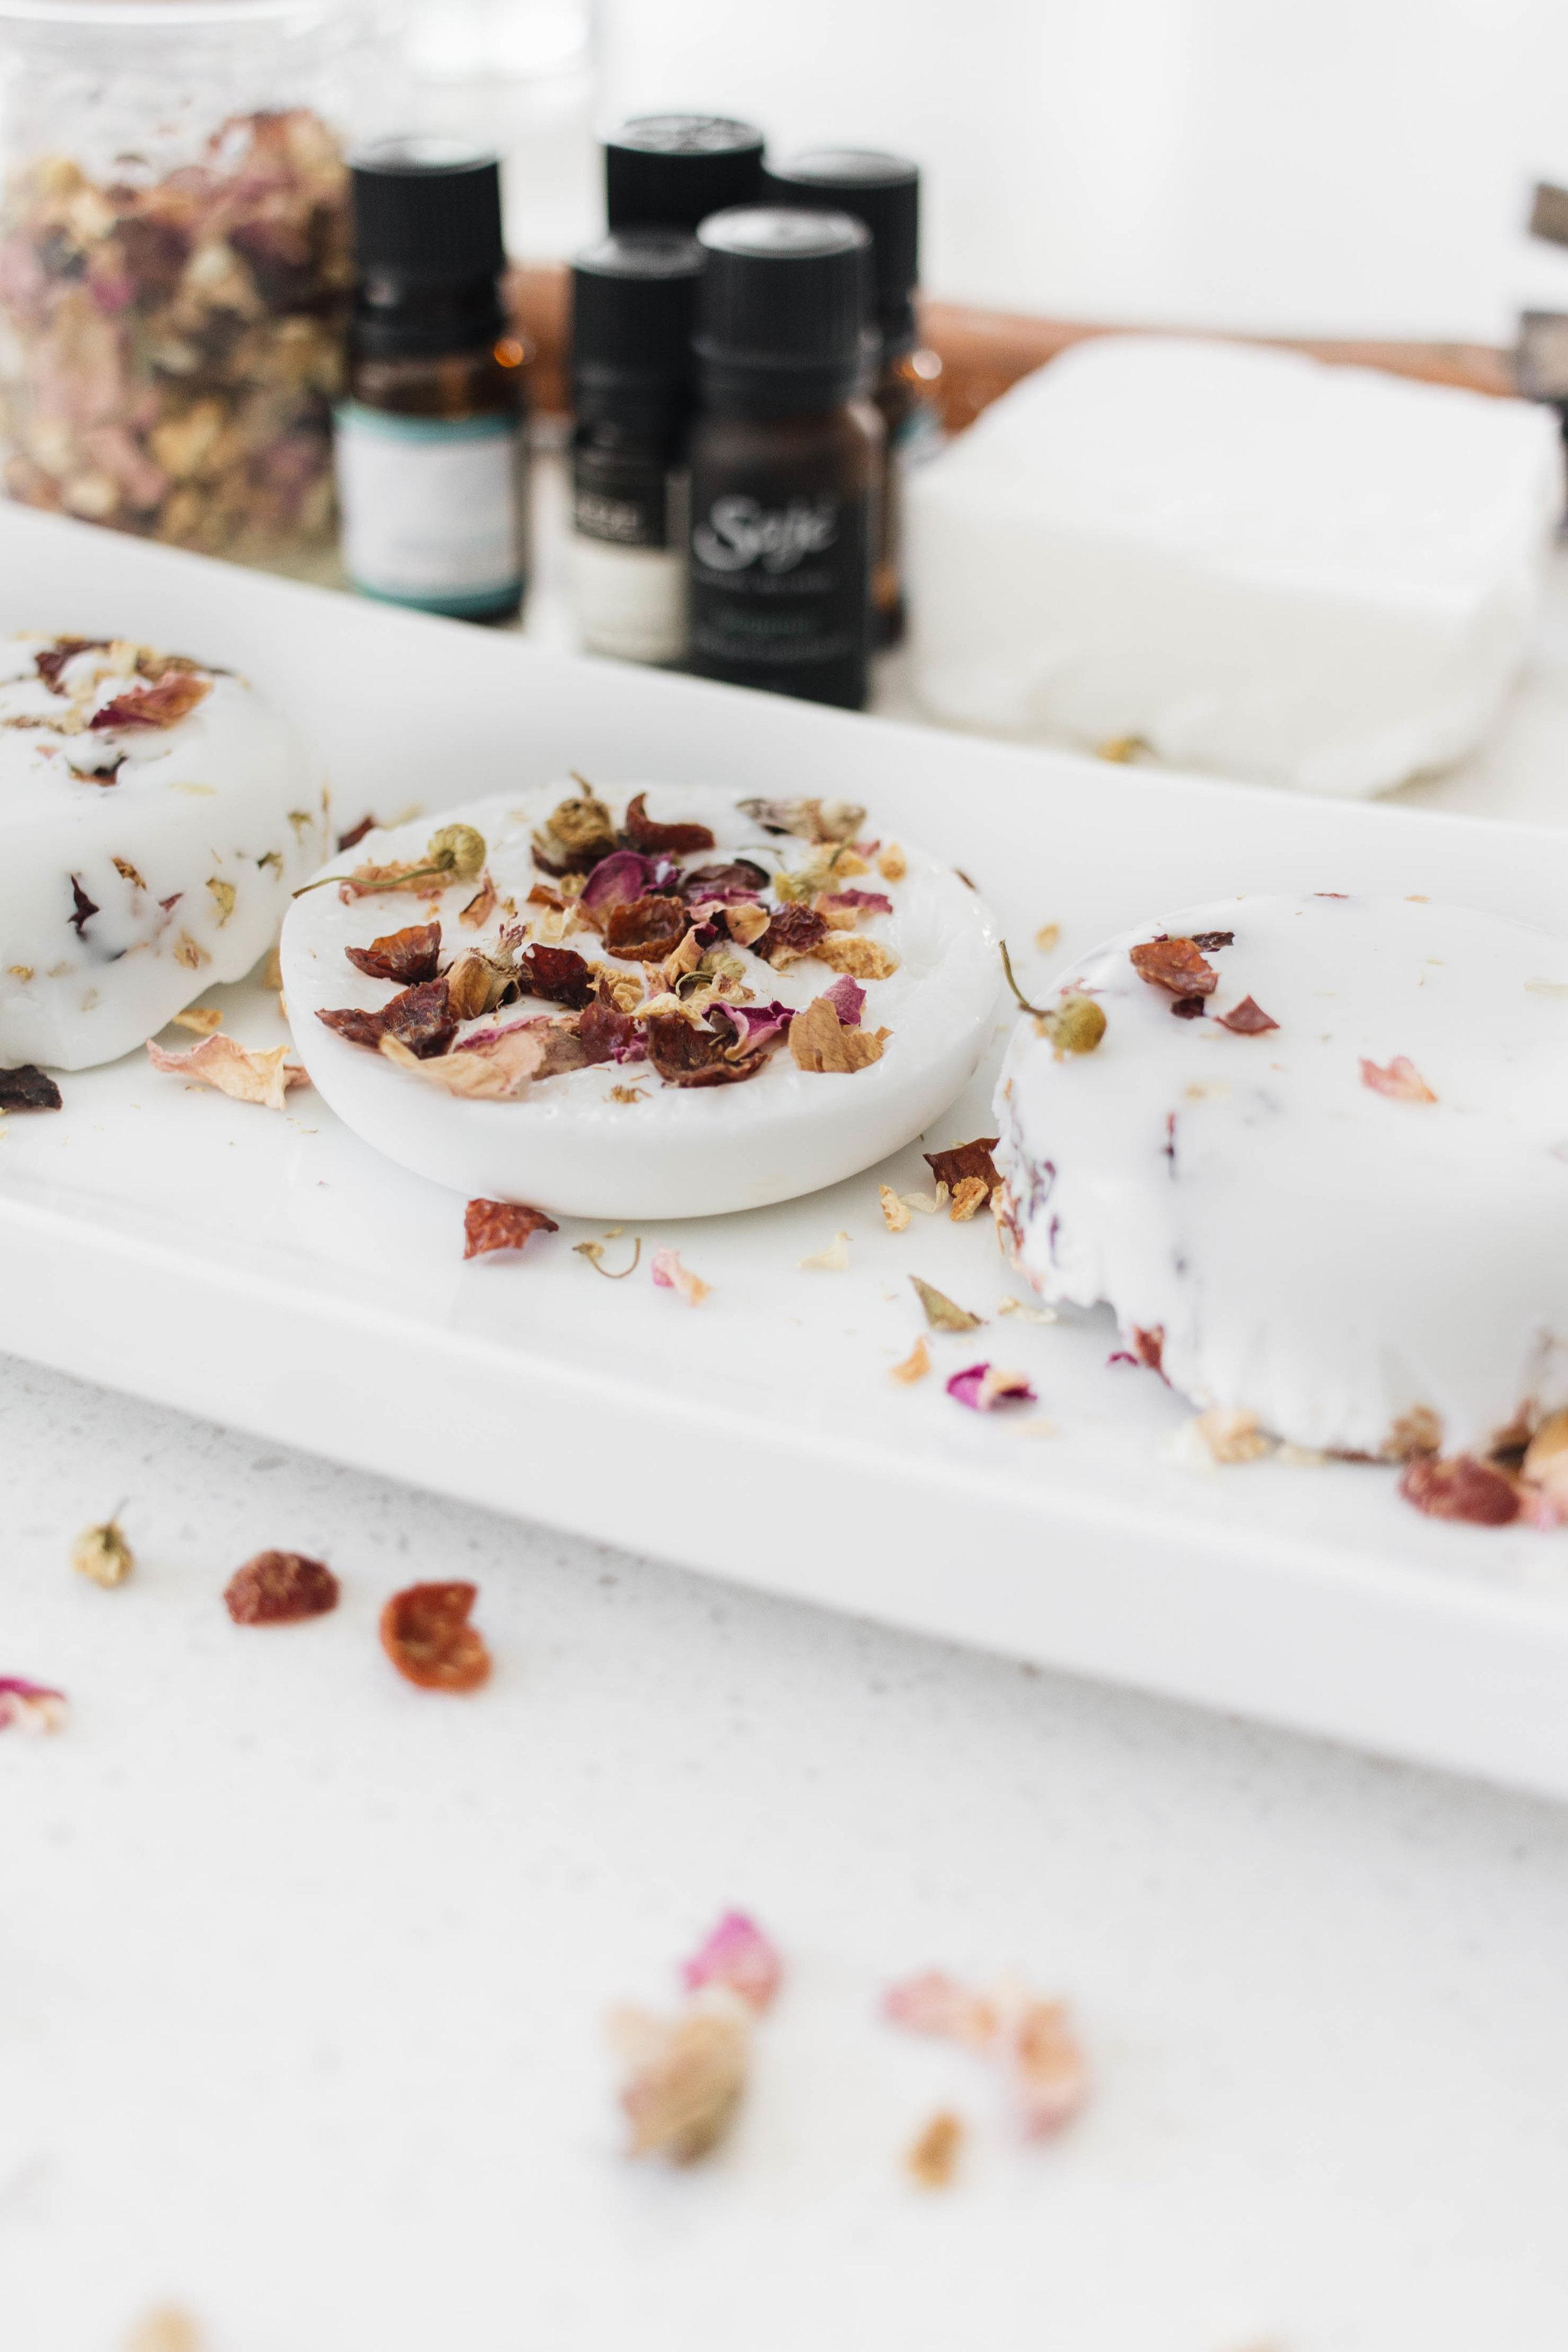 diy-soap-with-essential-oils-dried-flowers-3.jpg